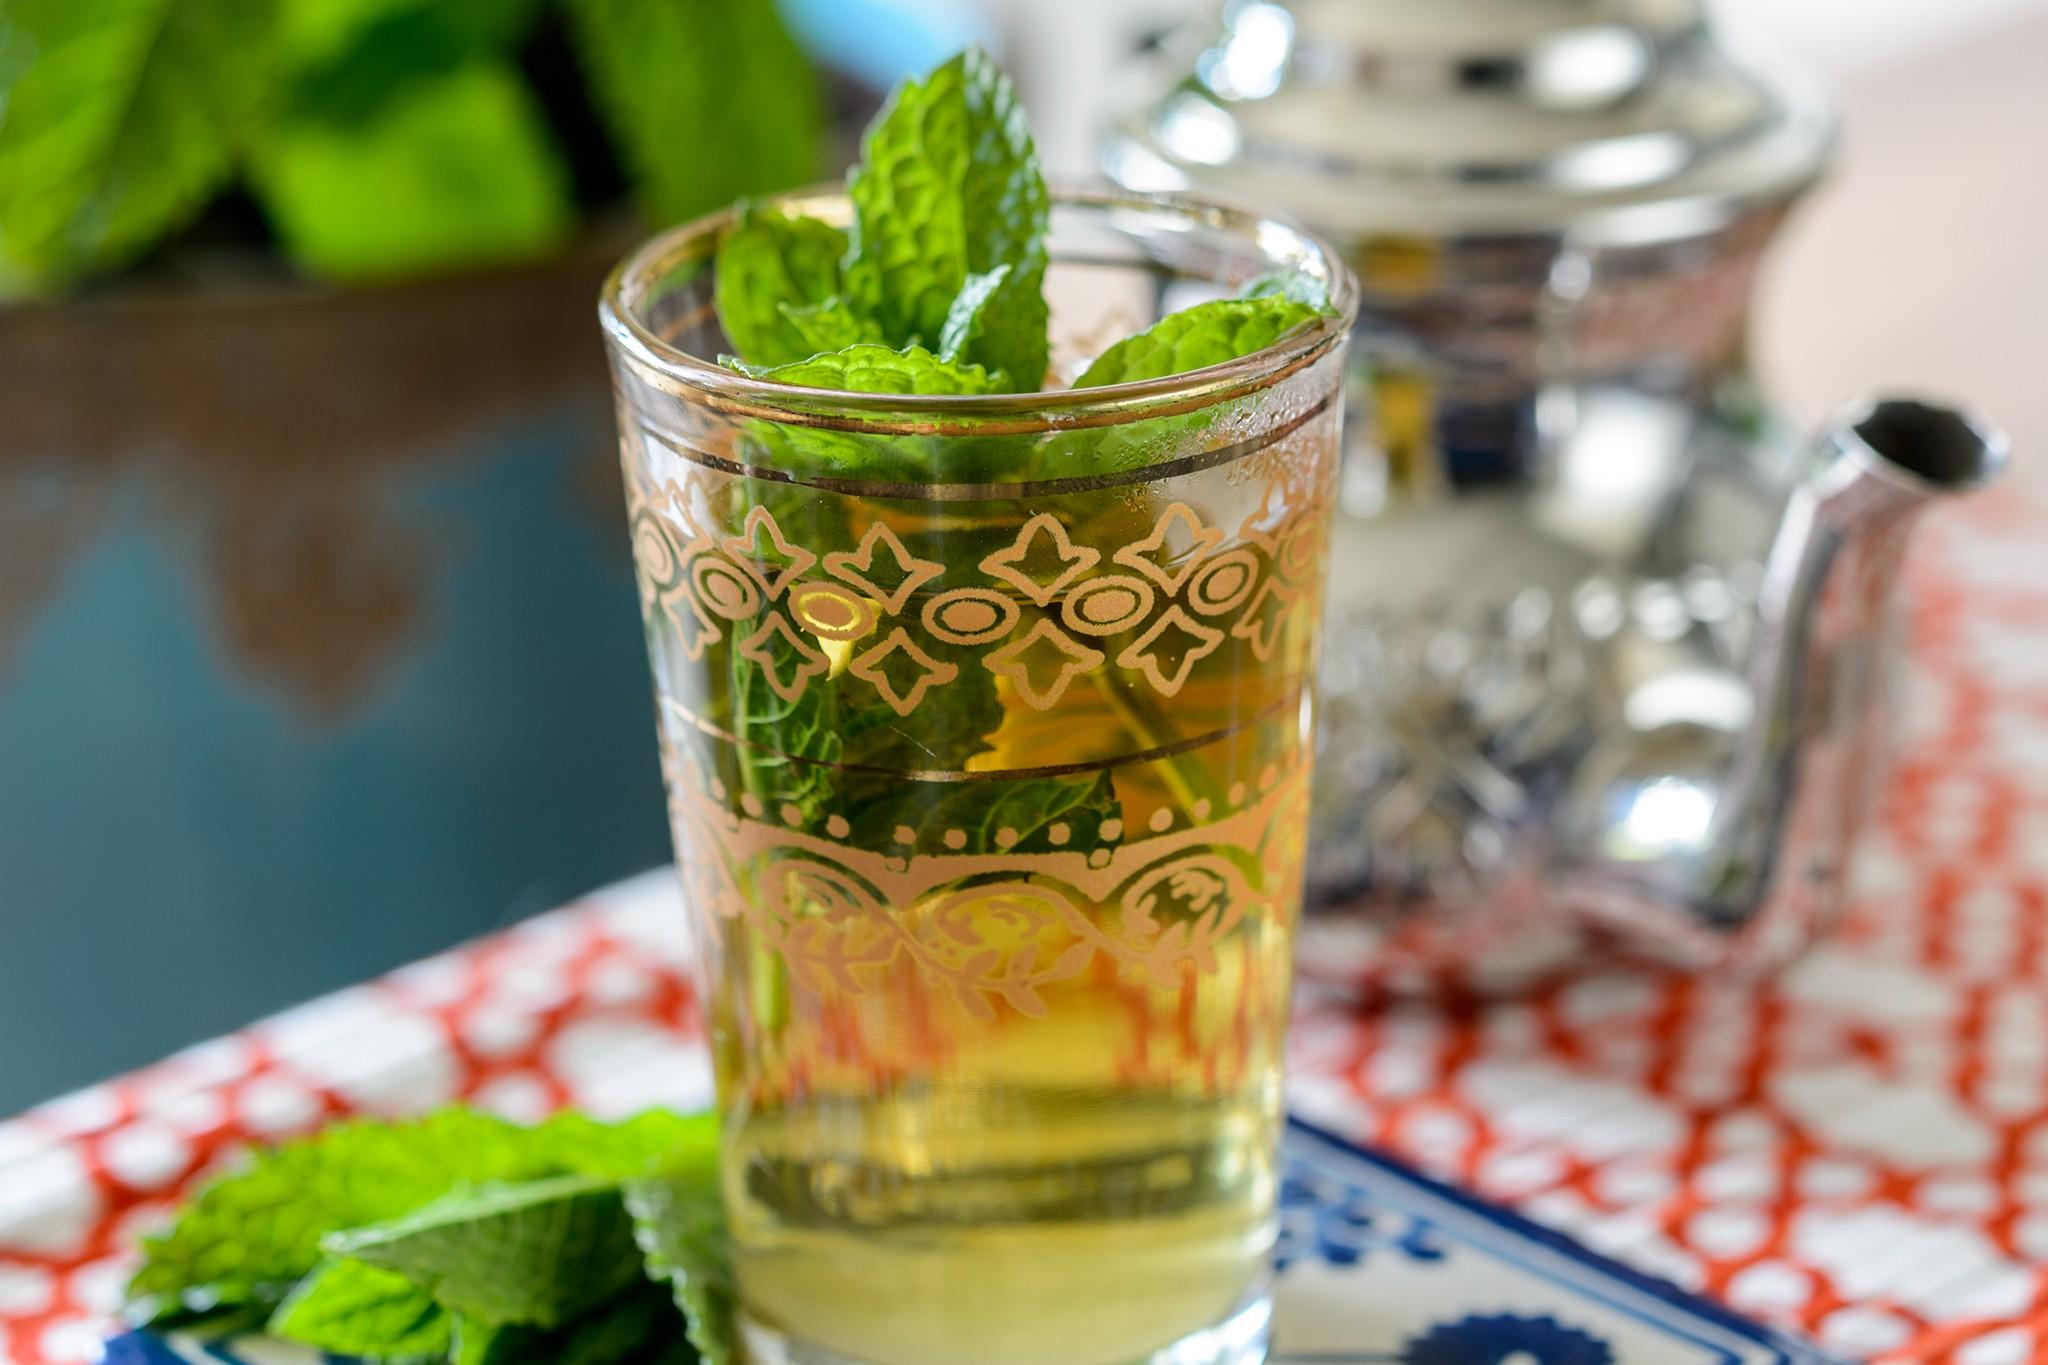 Plants to Grow for Herbal Tea